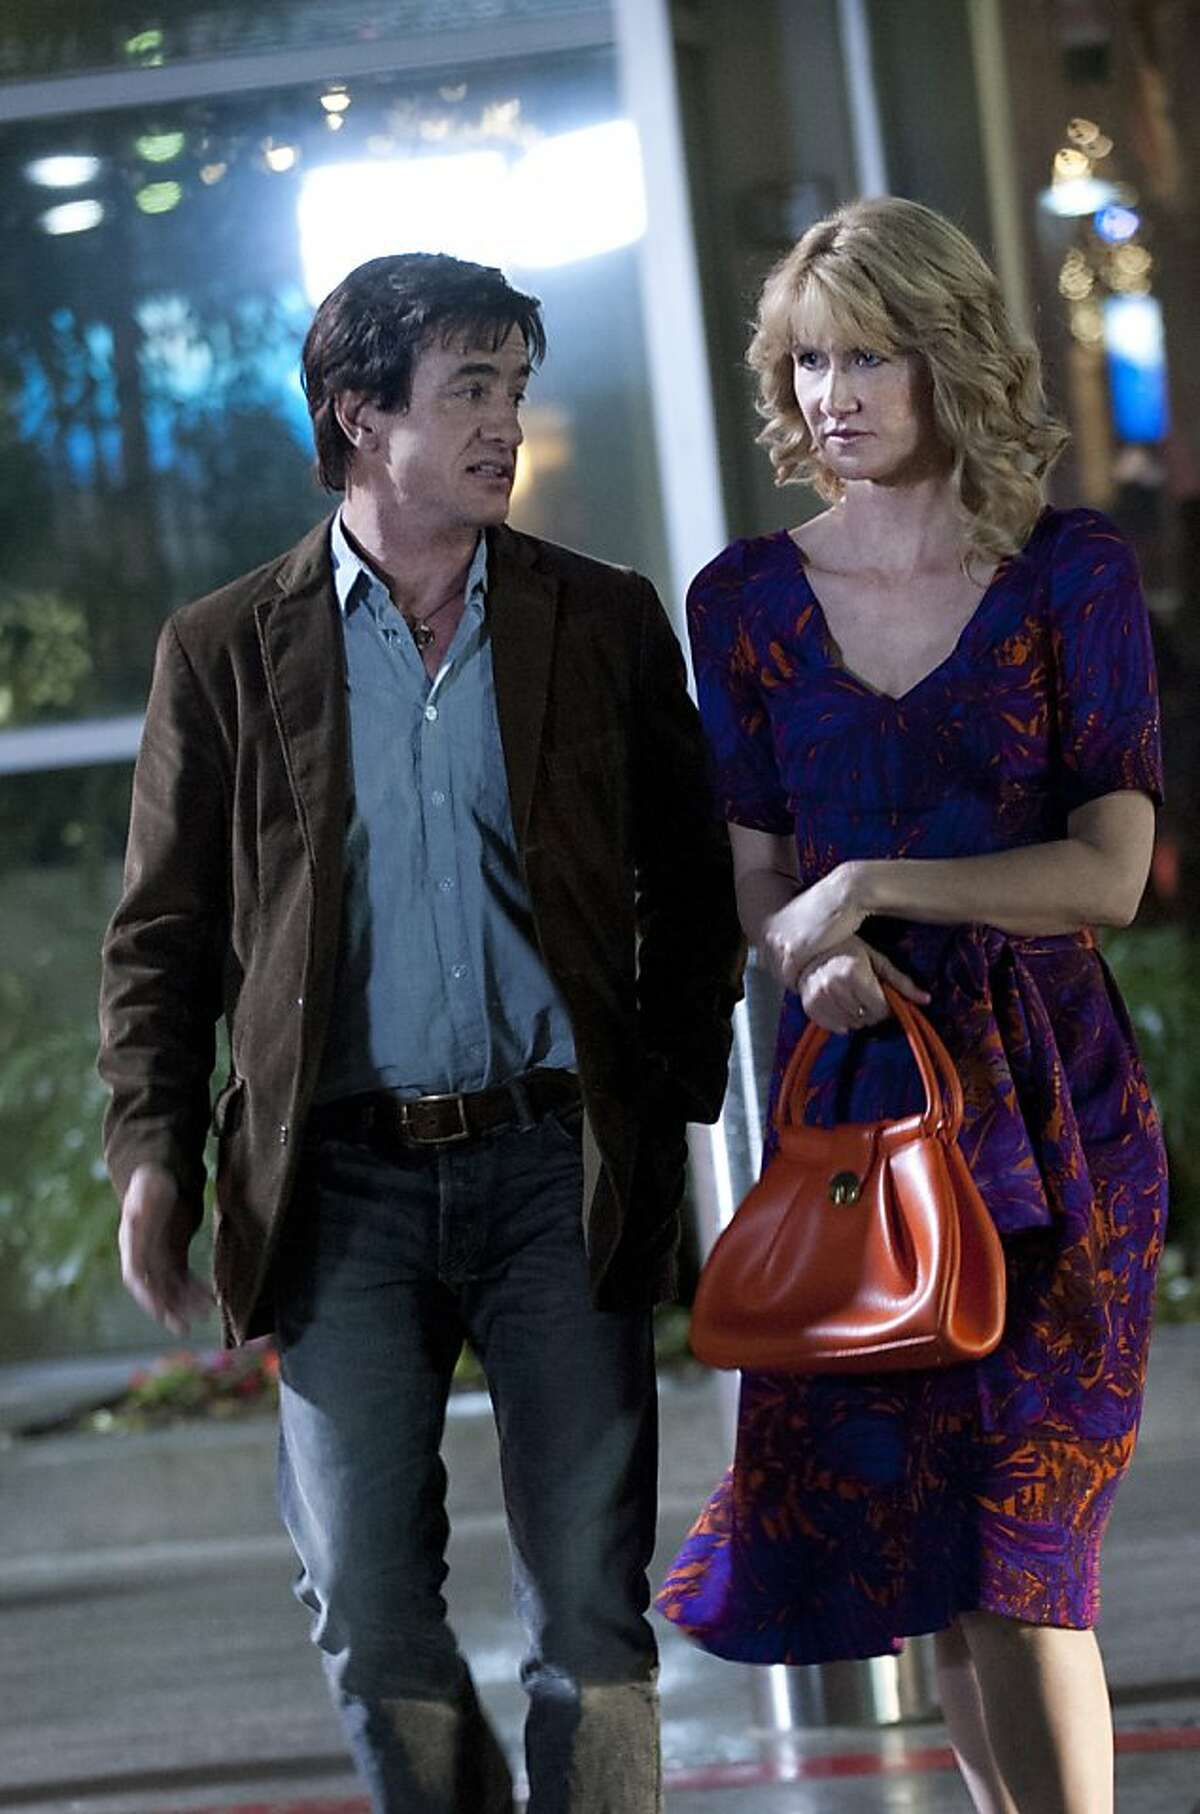 ENLIGHTENED 11 (Season 2, episode 1): Dermot Mulroney, Laura Dern.